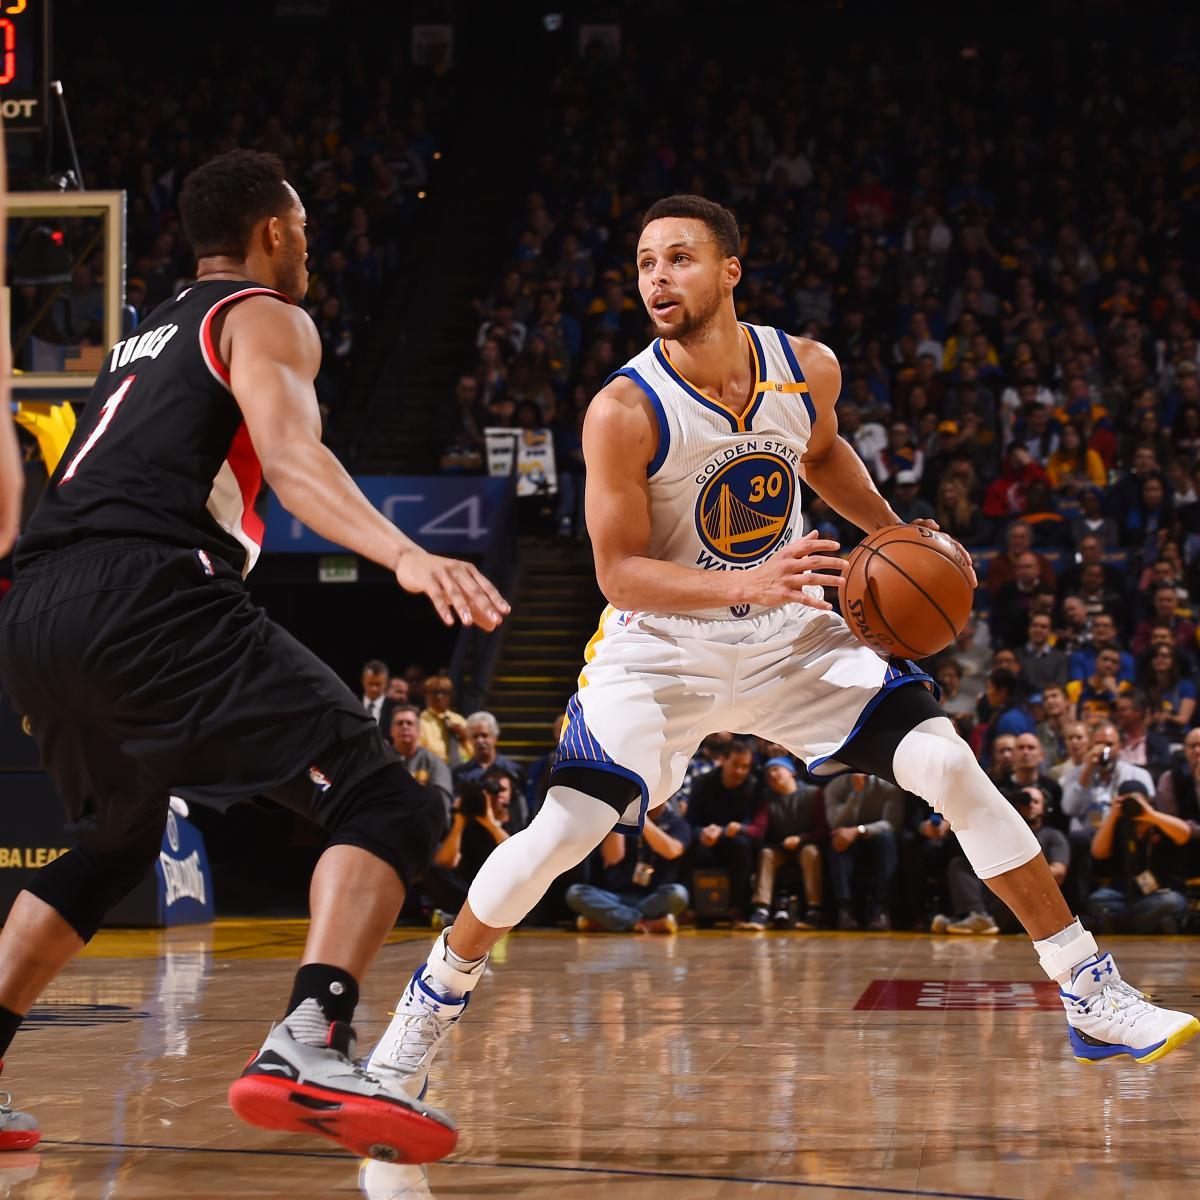 Portland Blazers Live Score: Trail Blazers Vs. Warriors: Score, Highlights, Reaction